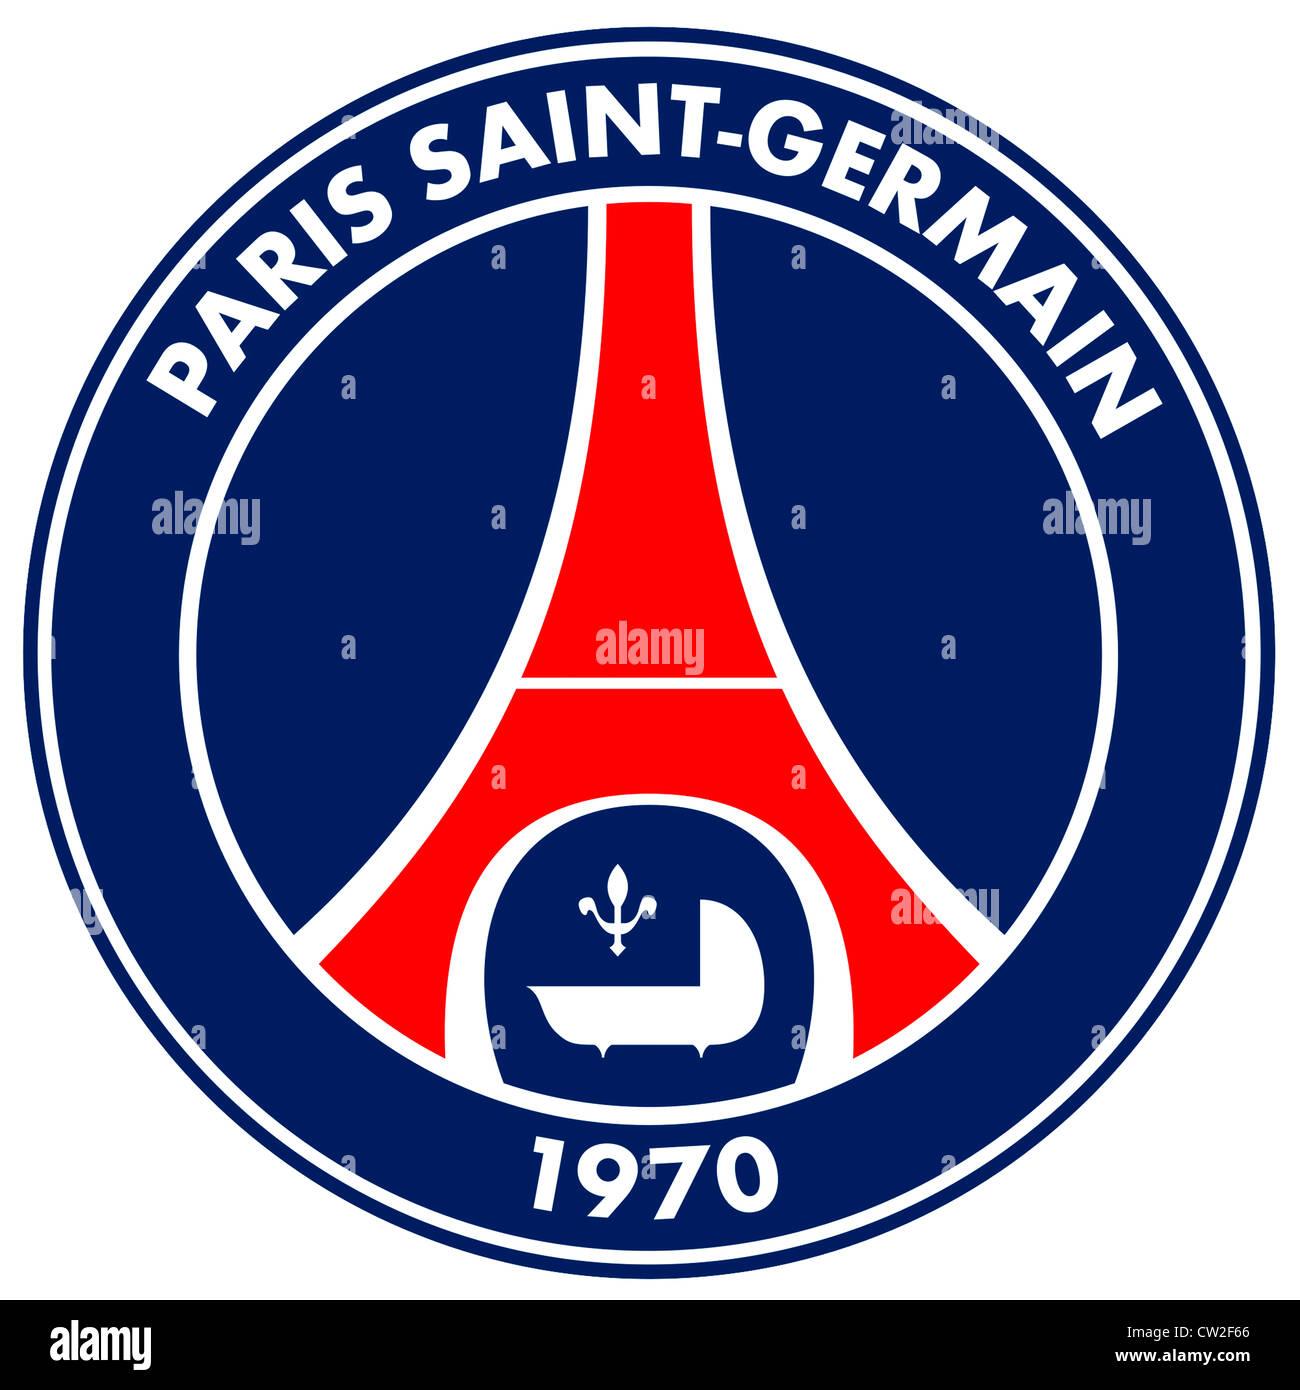 Logo of French football team Paris Saint-Germain Football Club PSG. Stock Photo